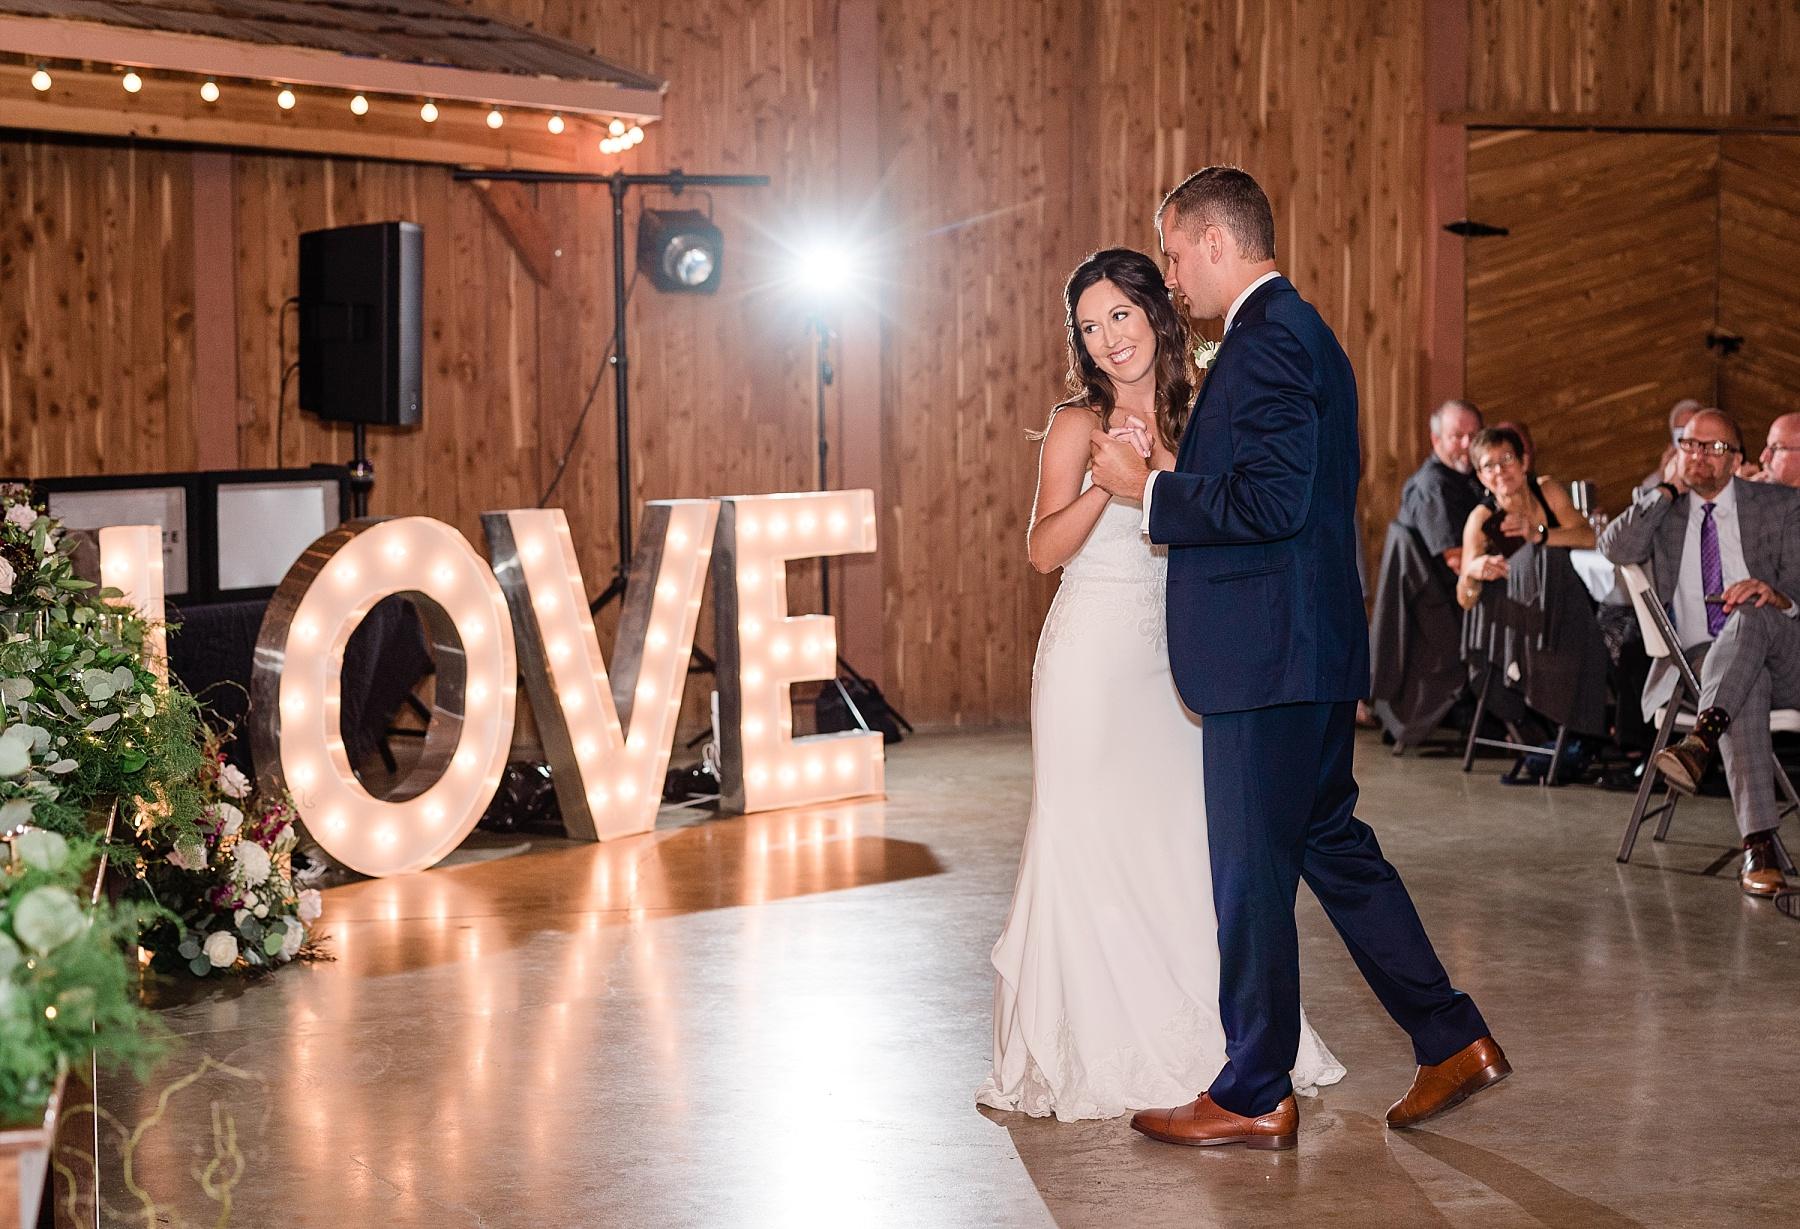 Romantic Summer Sunset Wedding Ceremony at Little Piney Lodge St. Louis Missouri by Kelsi Kliethermes Photography Fine Art Photographer_0022.jpg